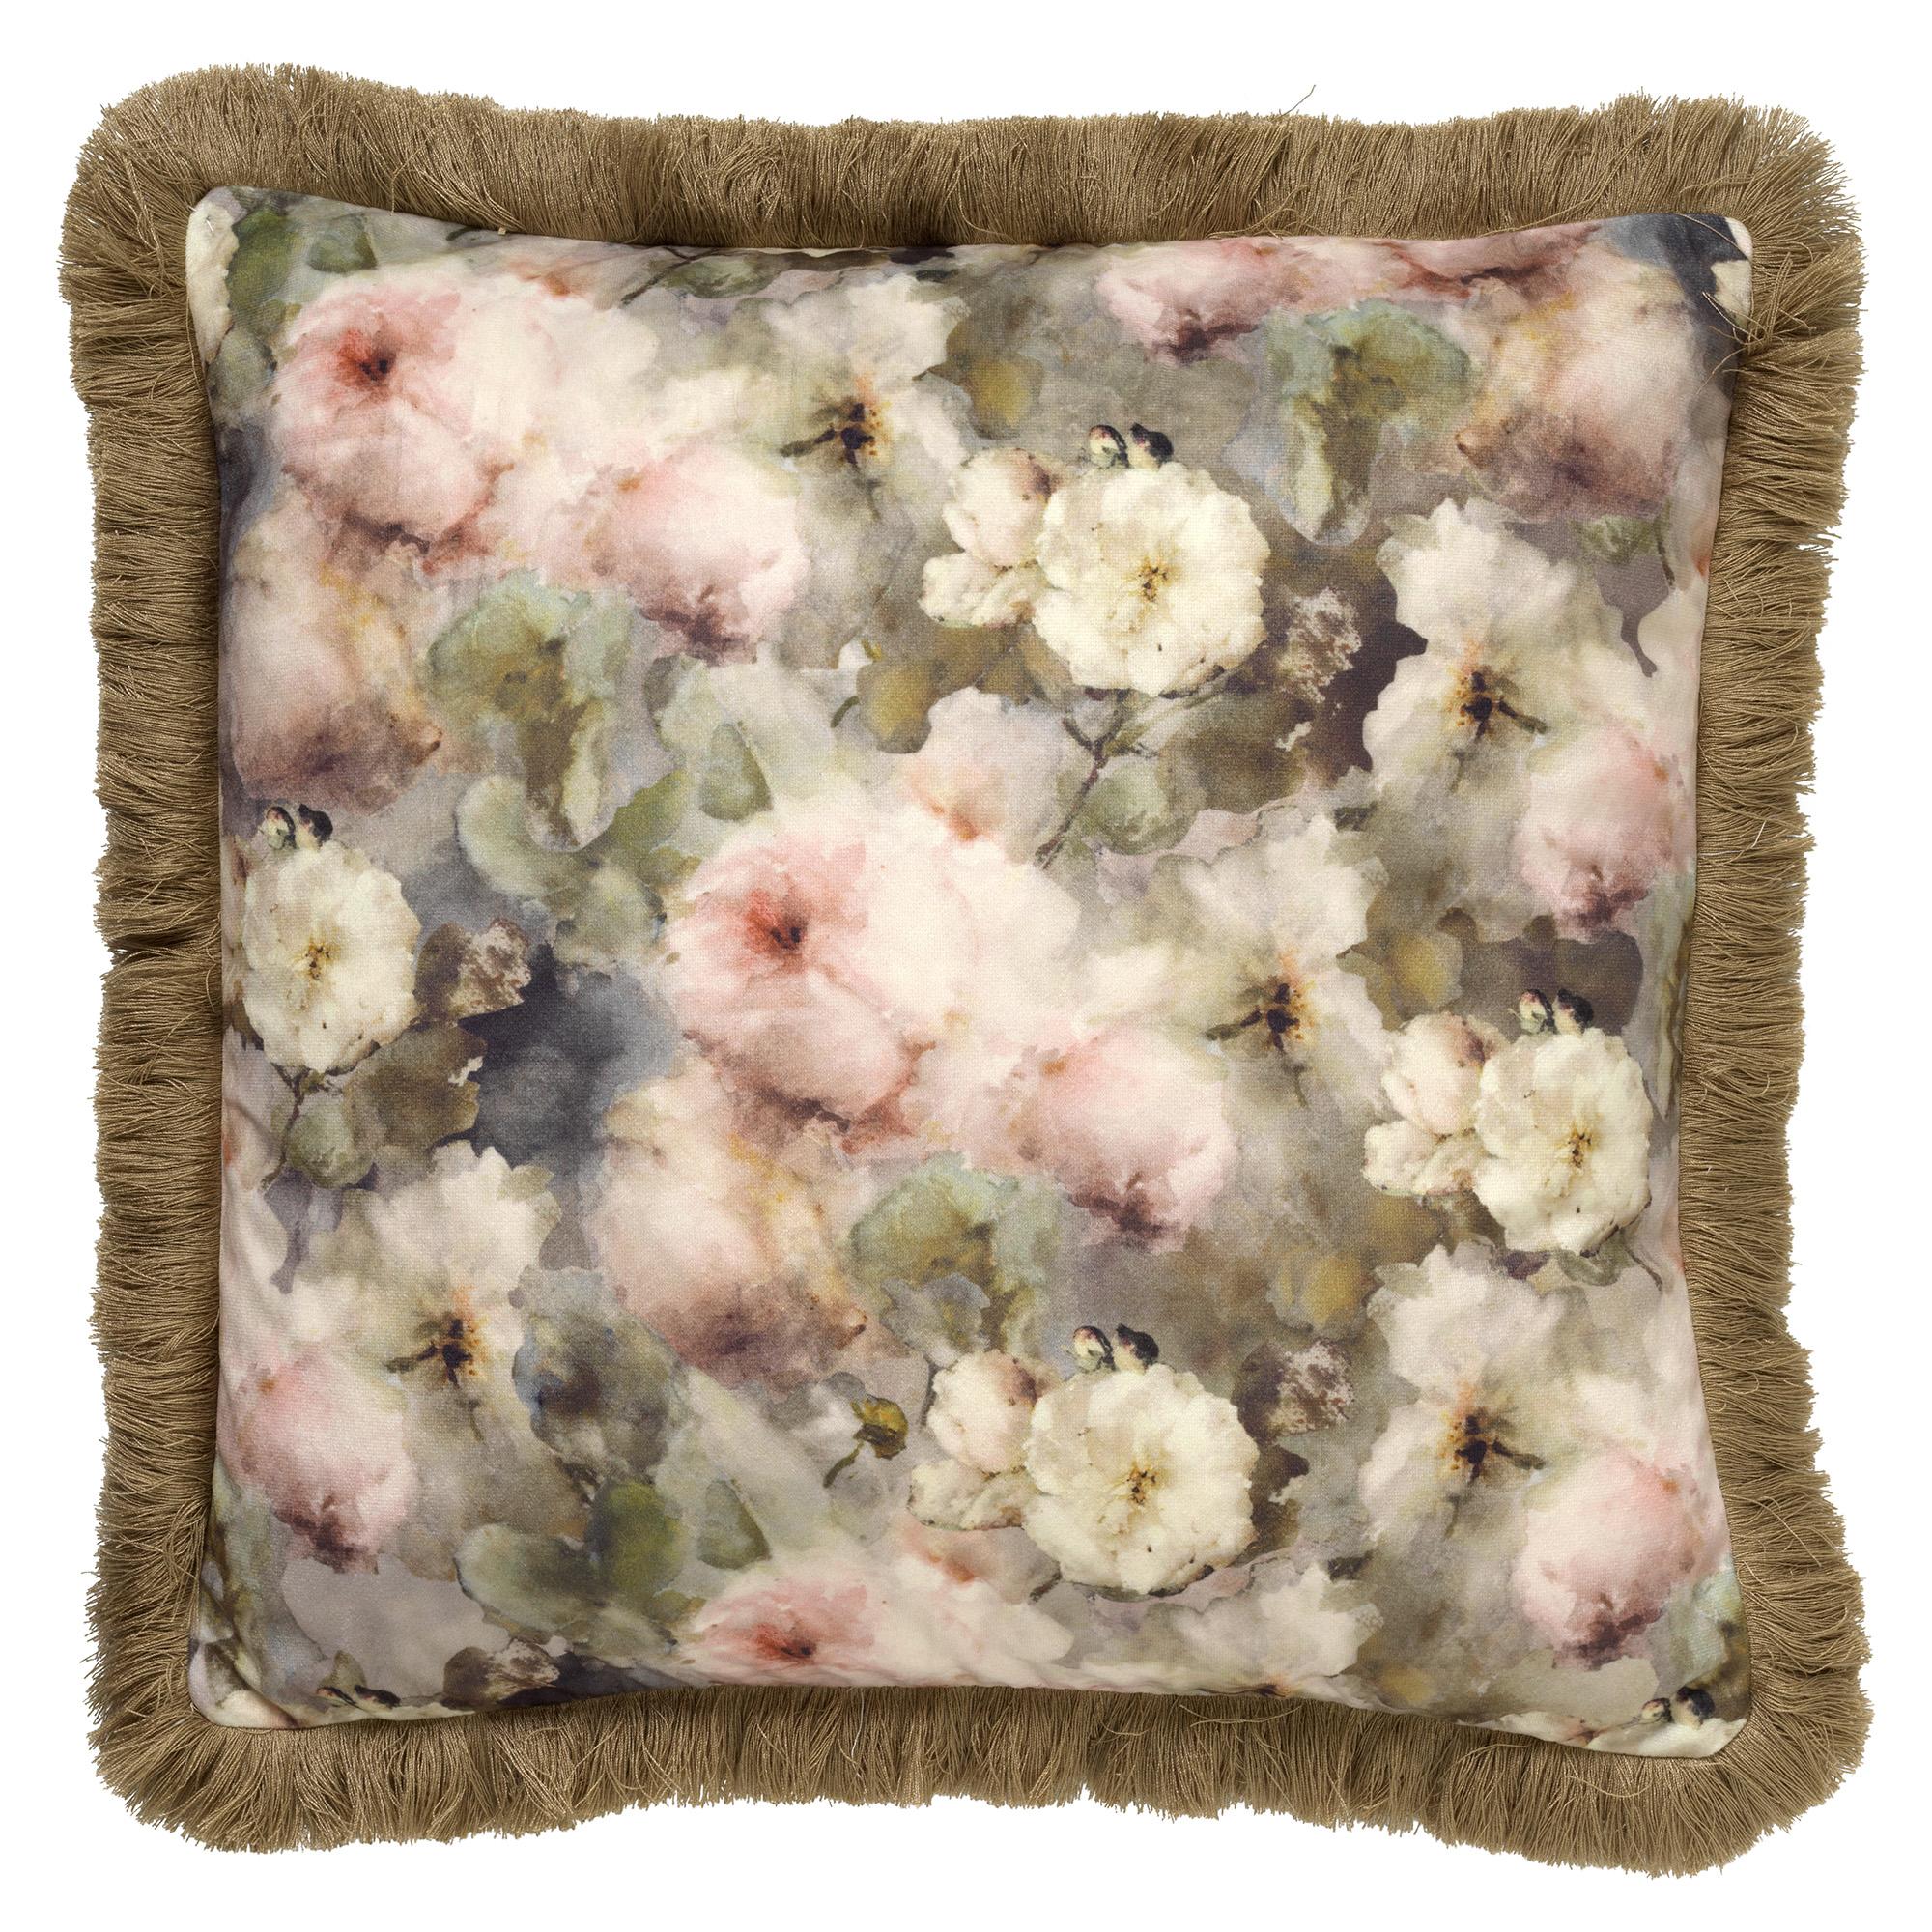 coussin en velours avec fleurs Grège 45x45